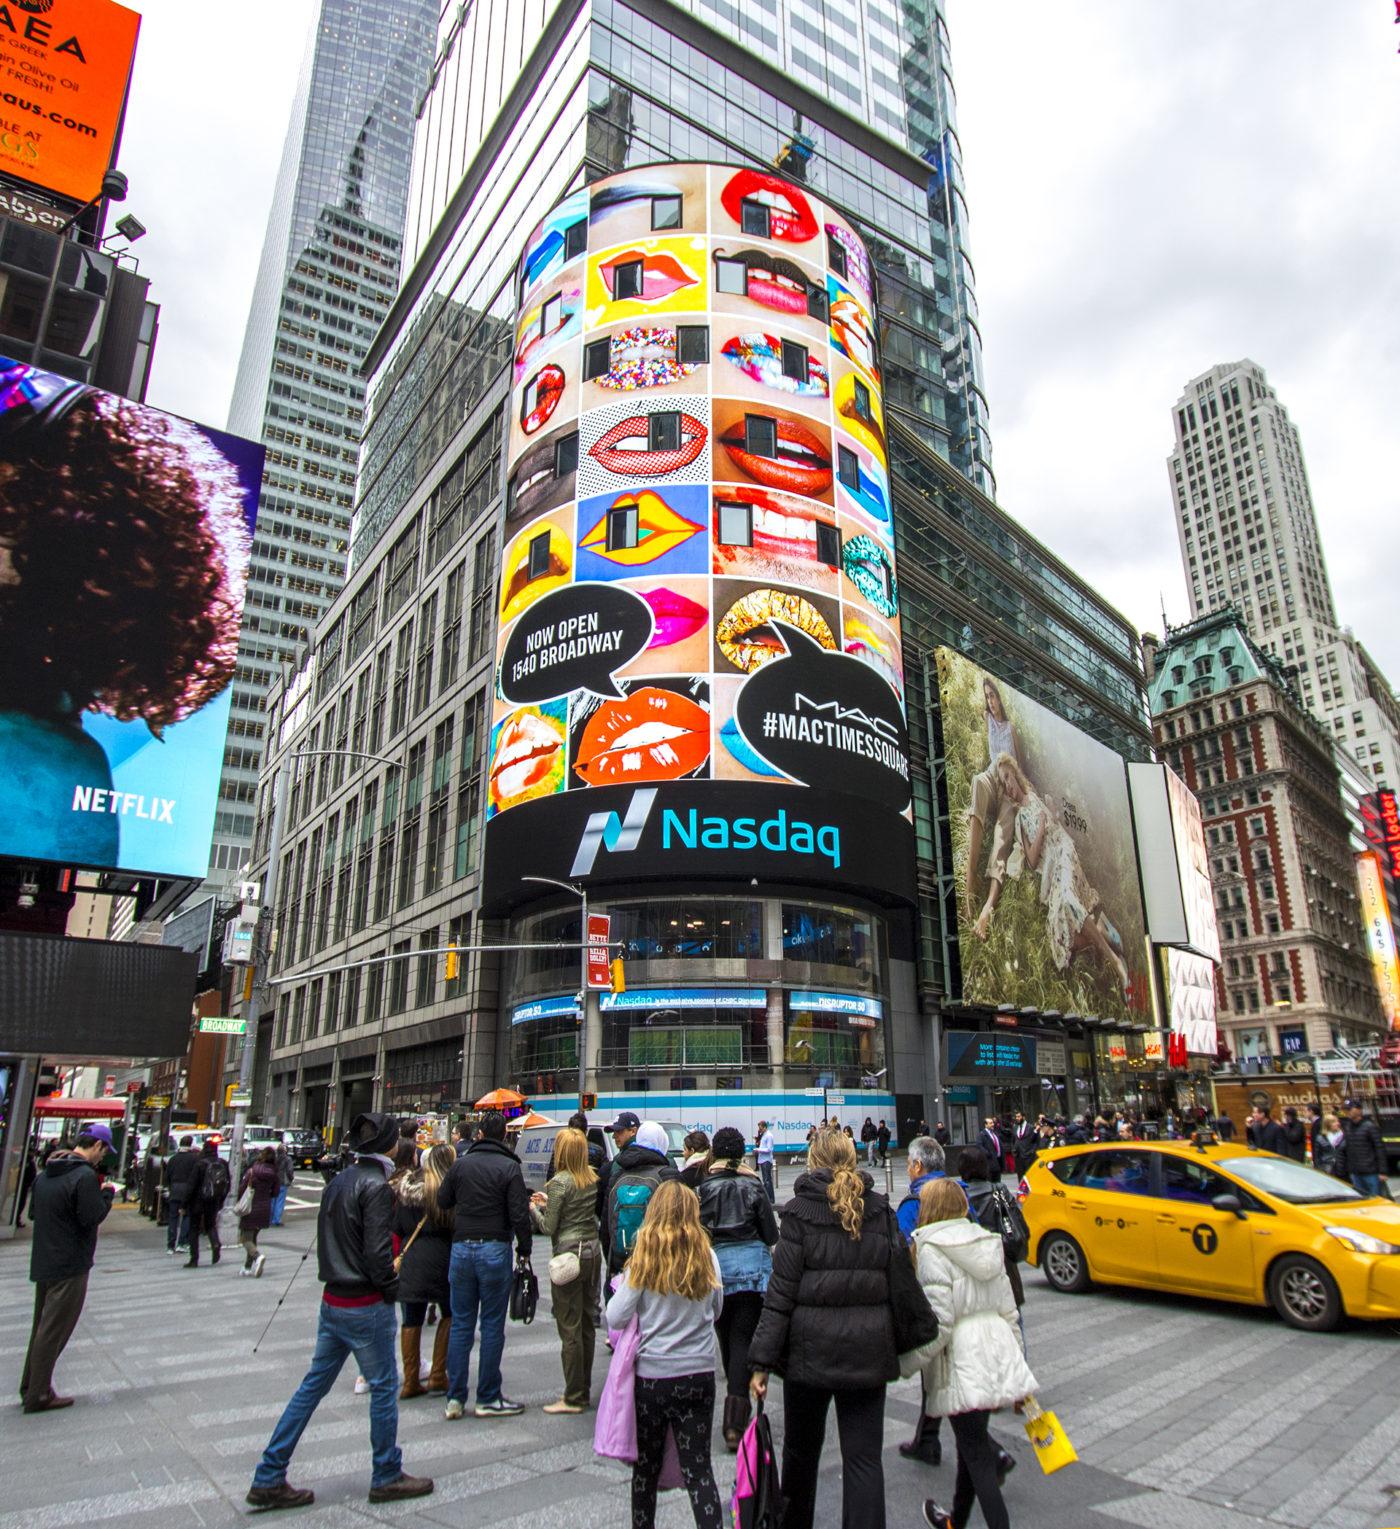 MAC Cosmetics - #MACTIMESQUARE - Nasdaq - Digital Domination (New York City, USA)